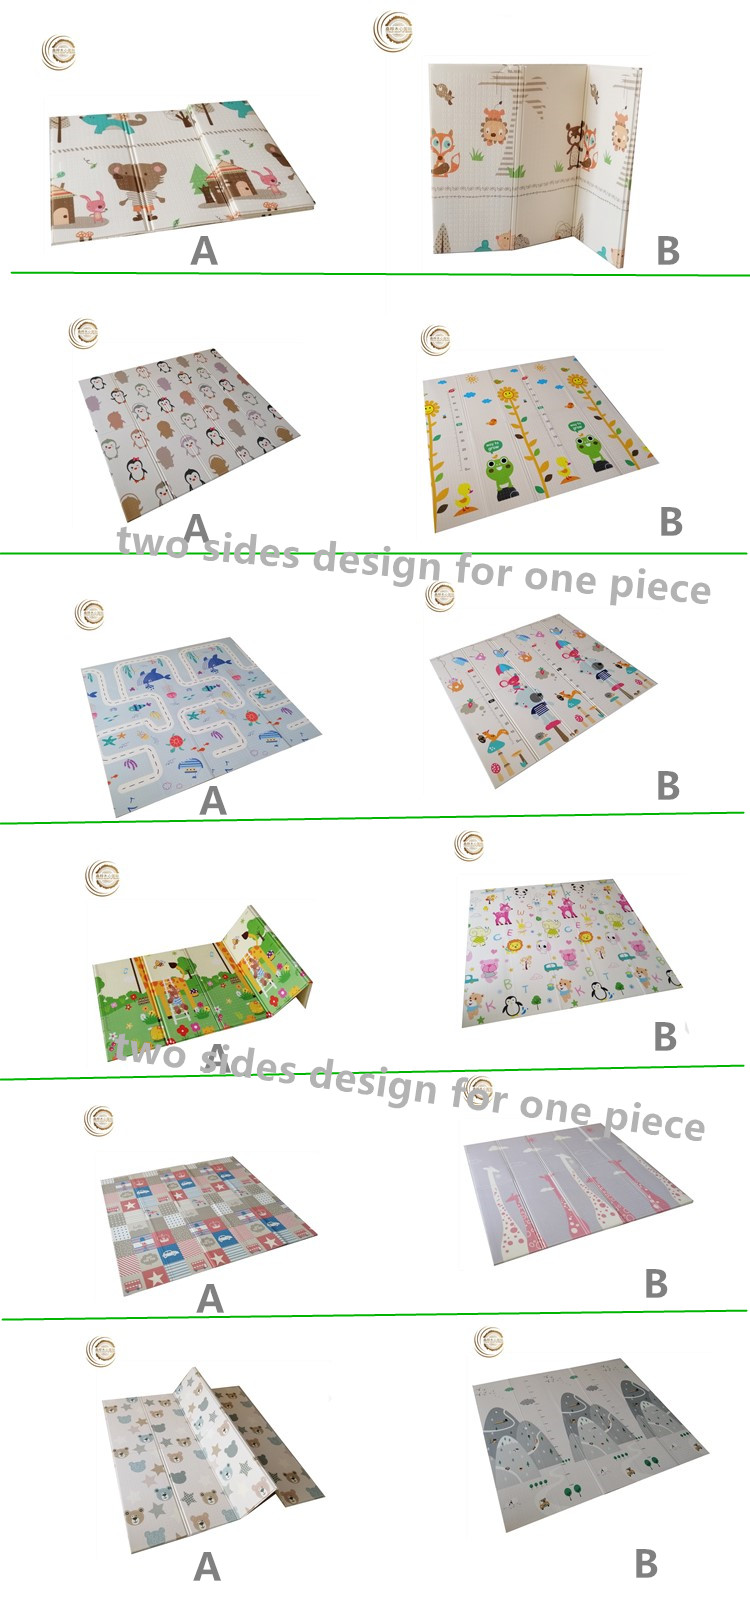 Foam Pads Granules Foam Pads Granules Honeycomb Cushion